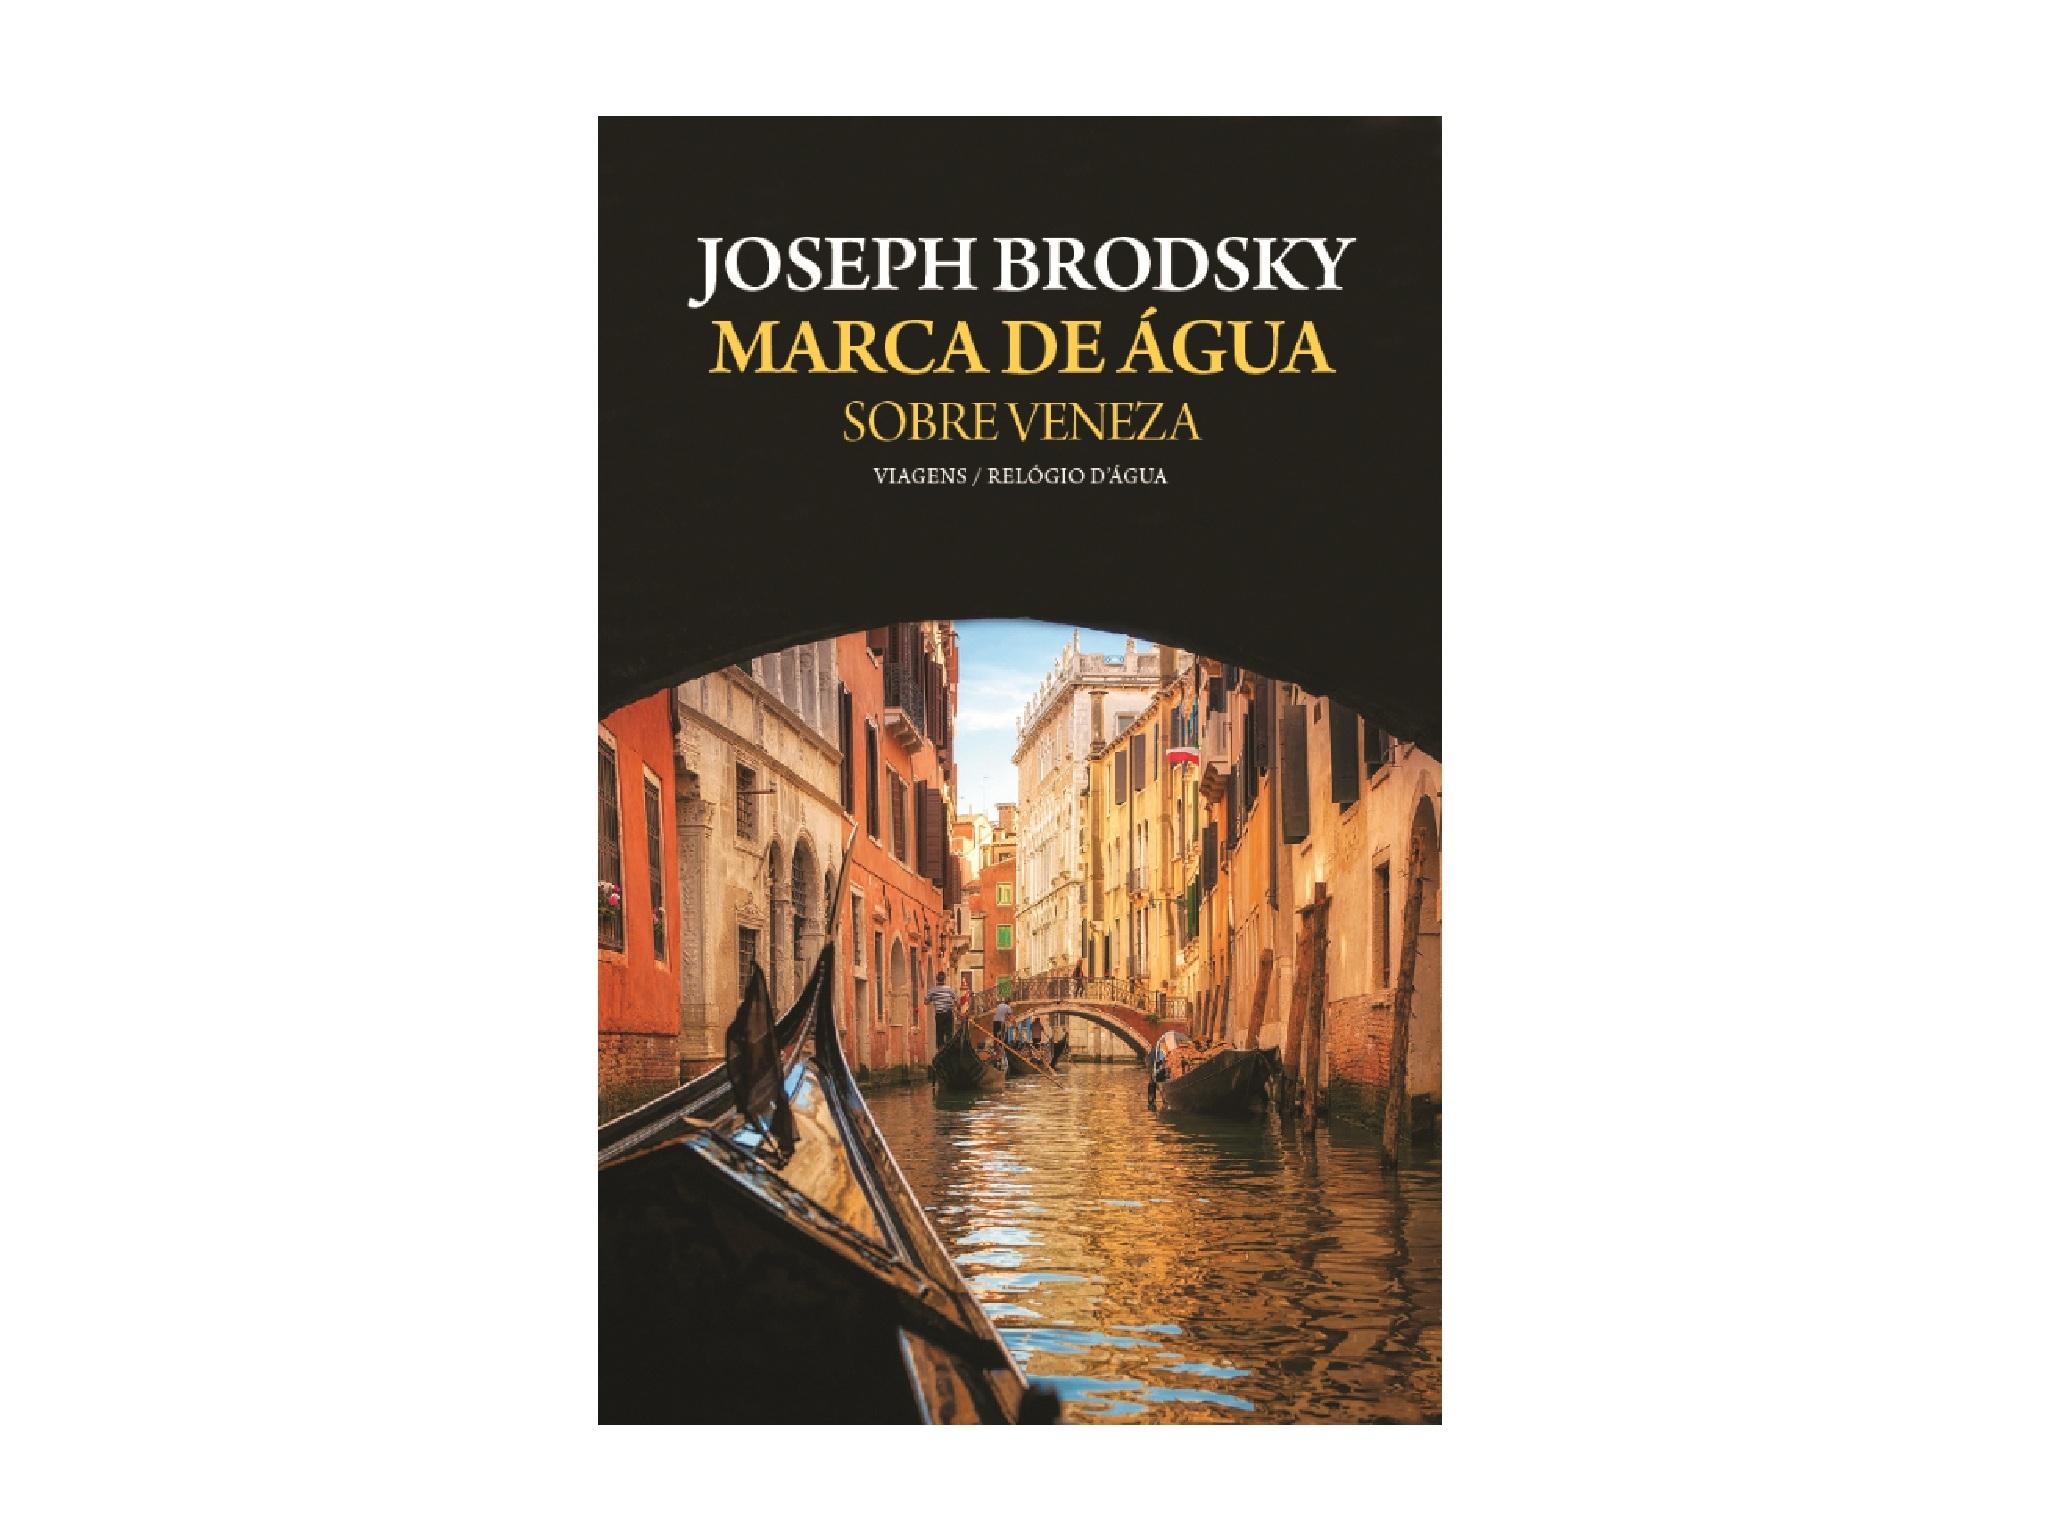 Livro, Leitura, Marca de Água, Joseph Brodsky